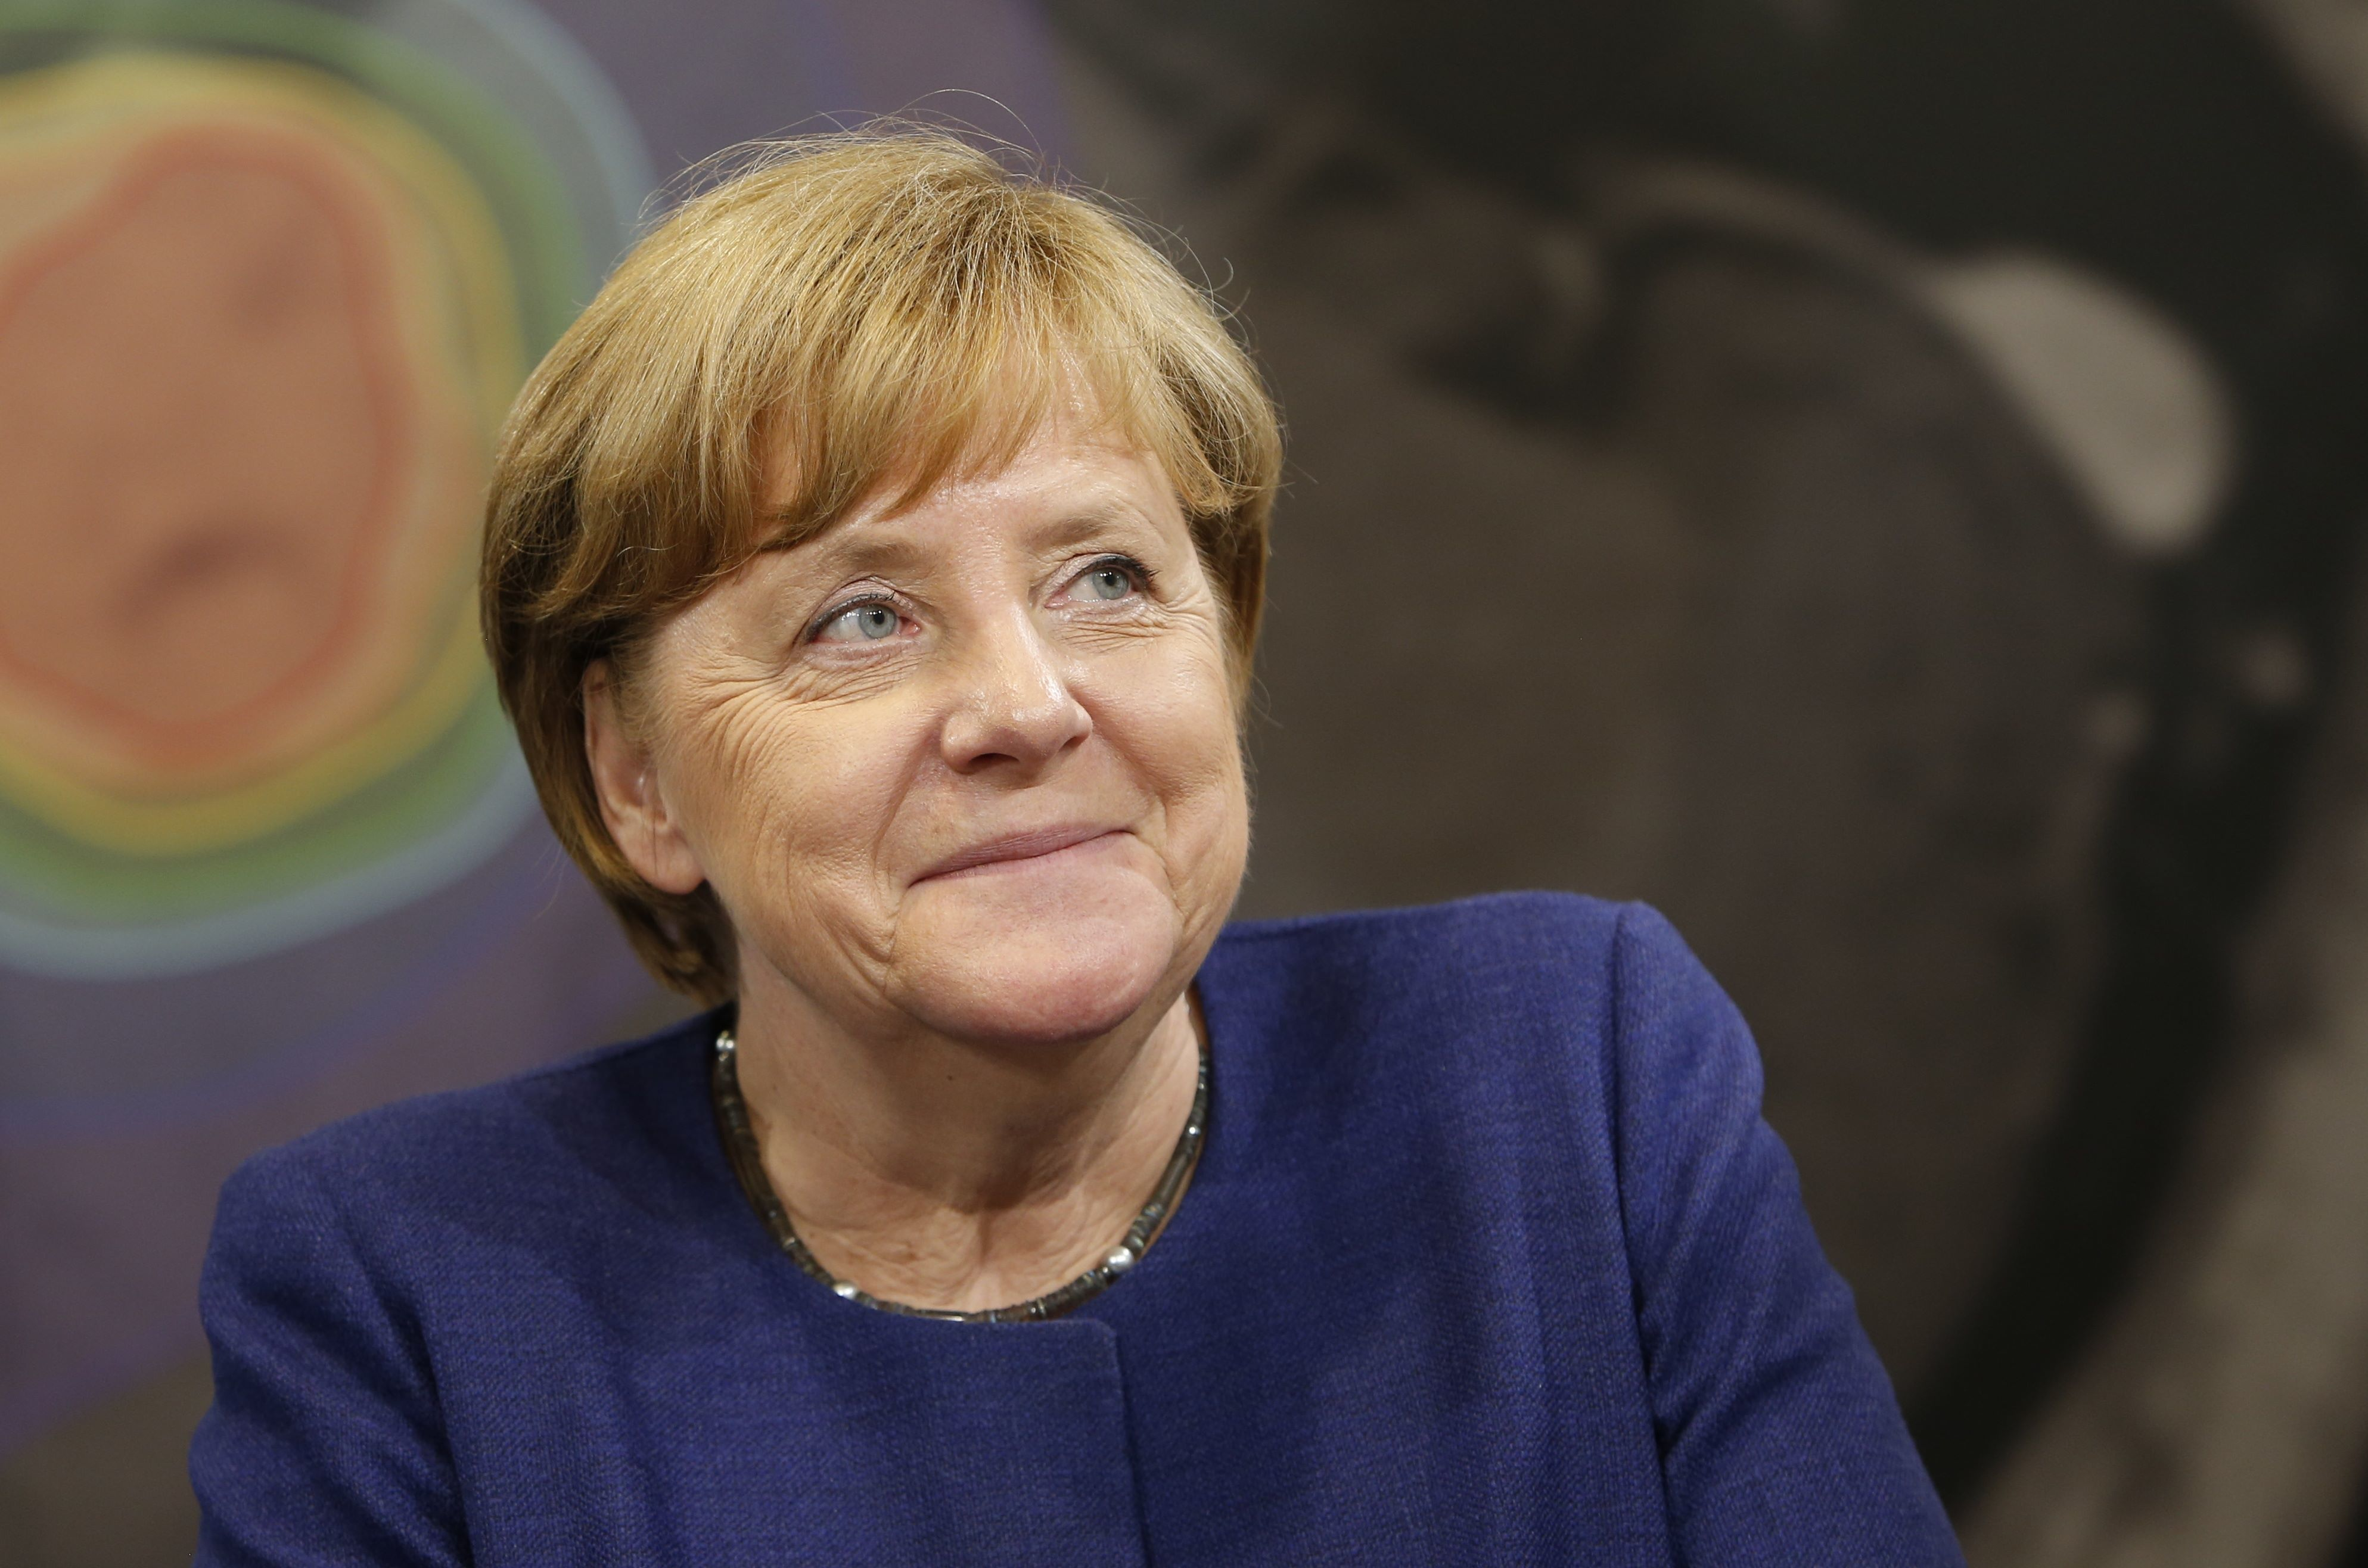 Hot Angela Merkel nude photos 2019